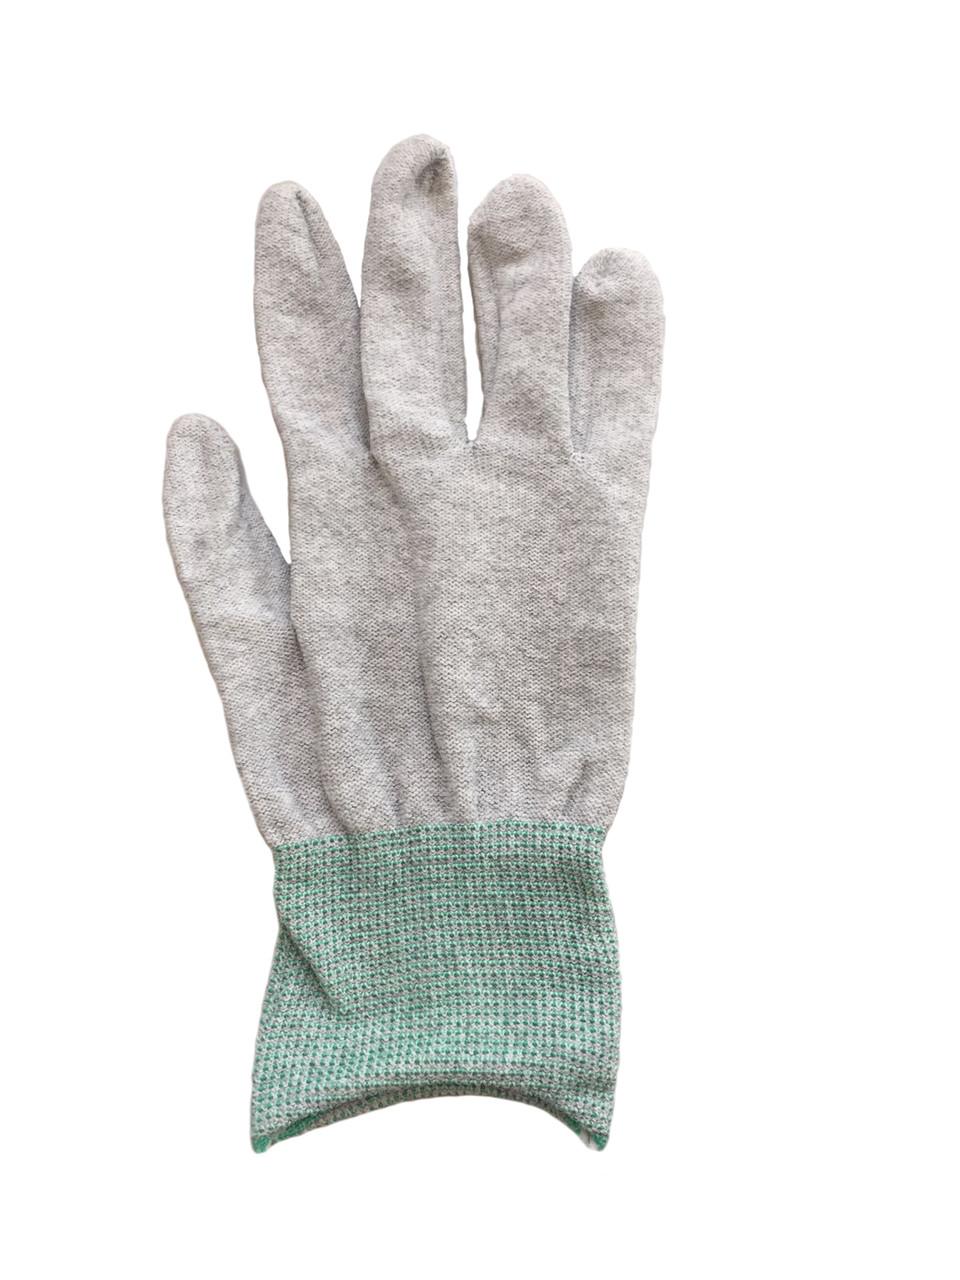 TM-251 Перчатки для установщиков пленок - CARIGHT glove for car wrapping